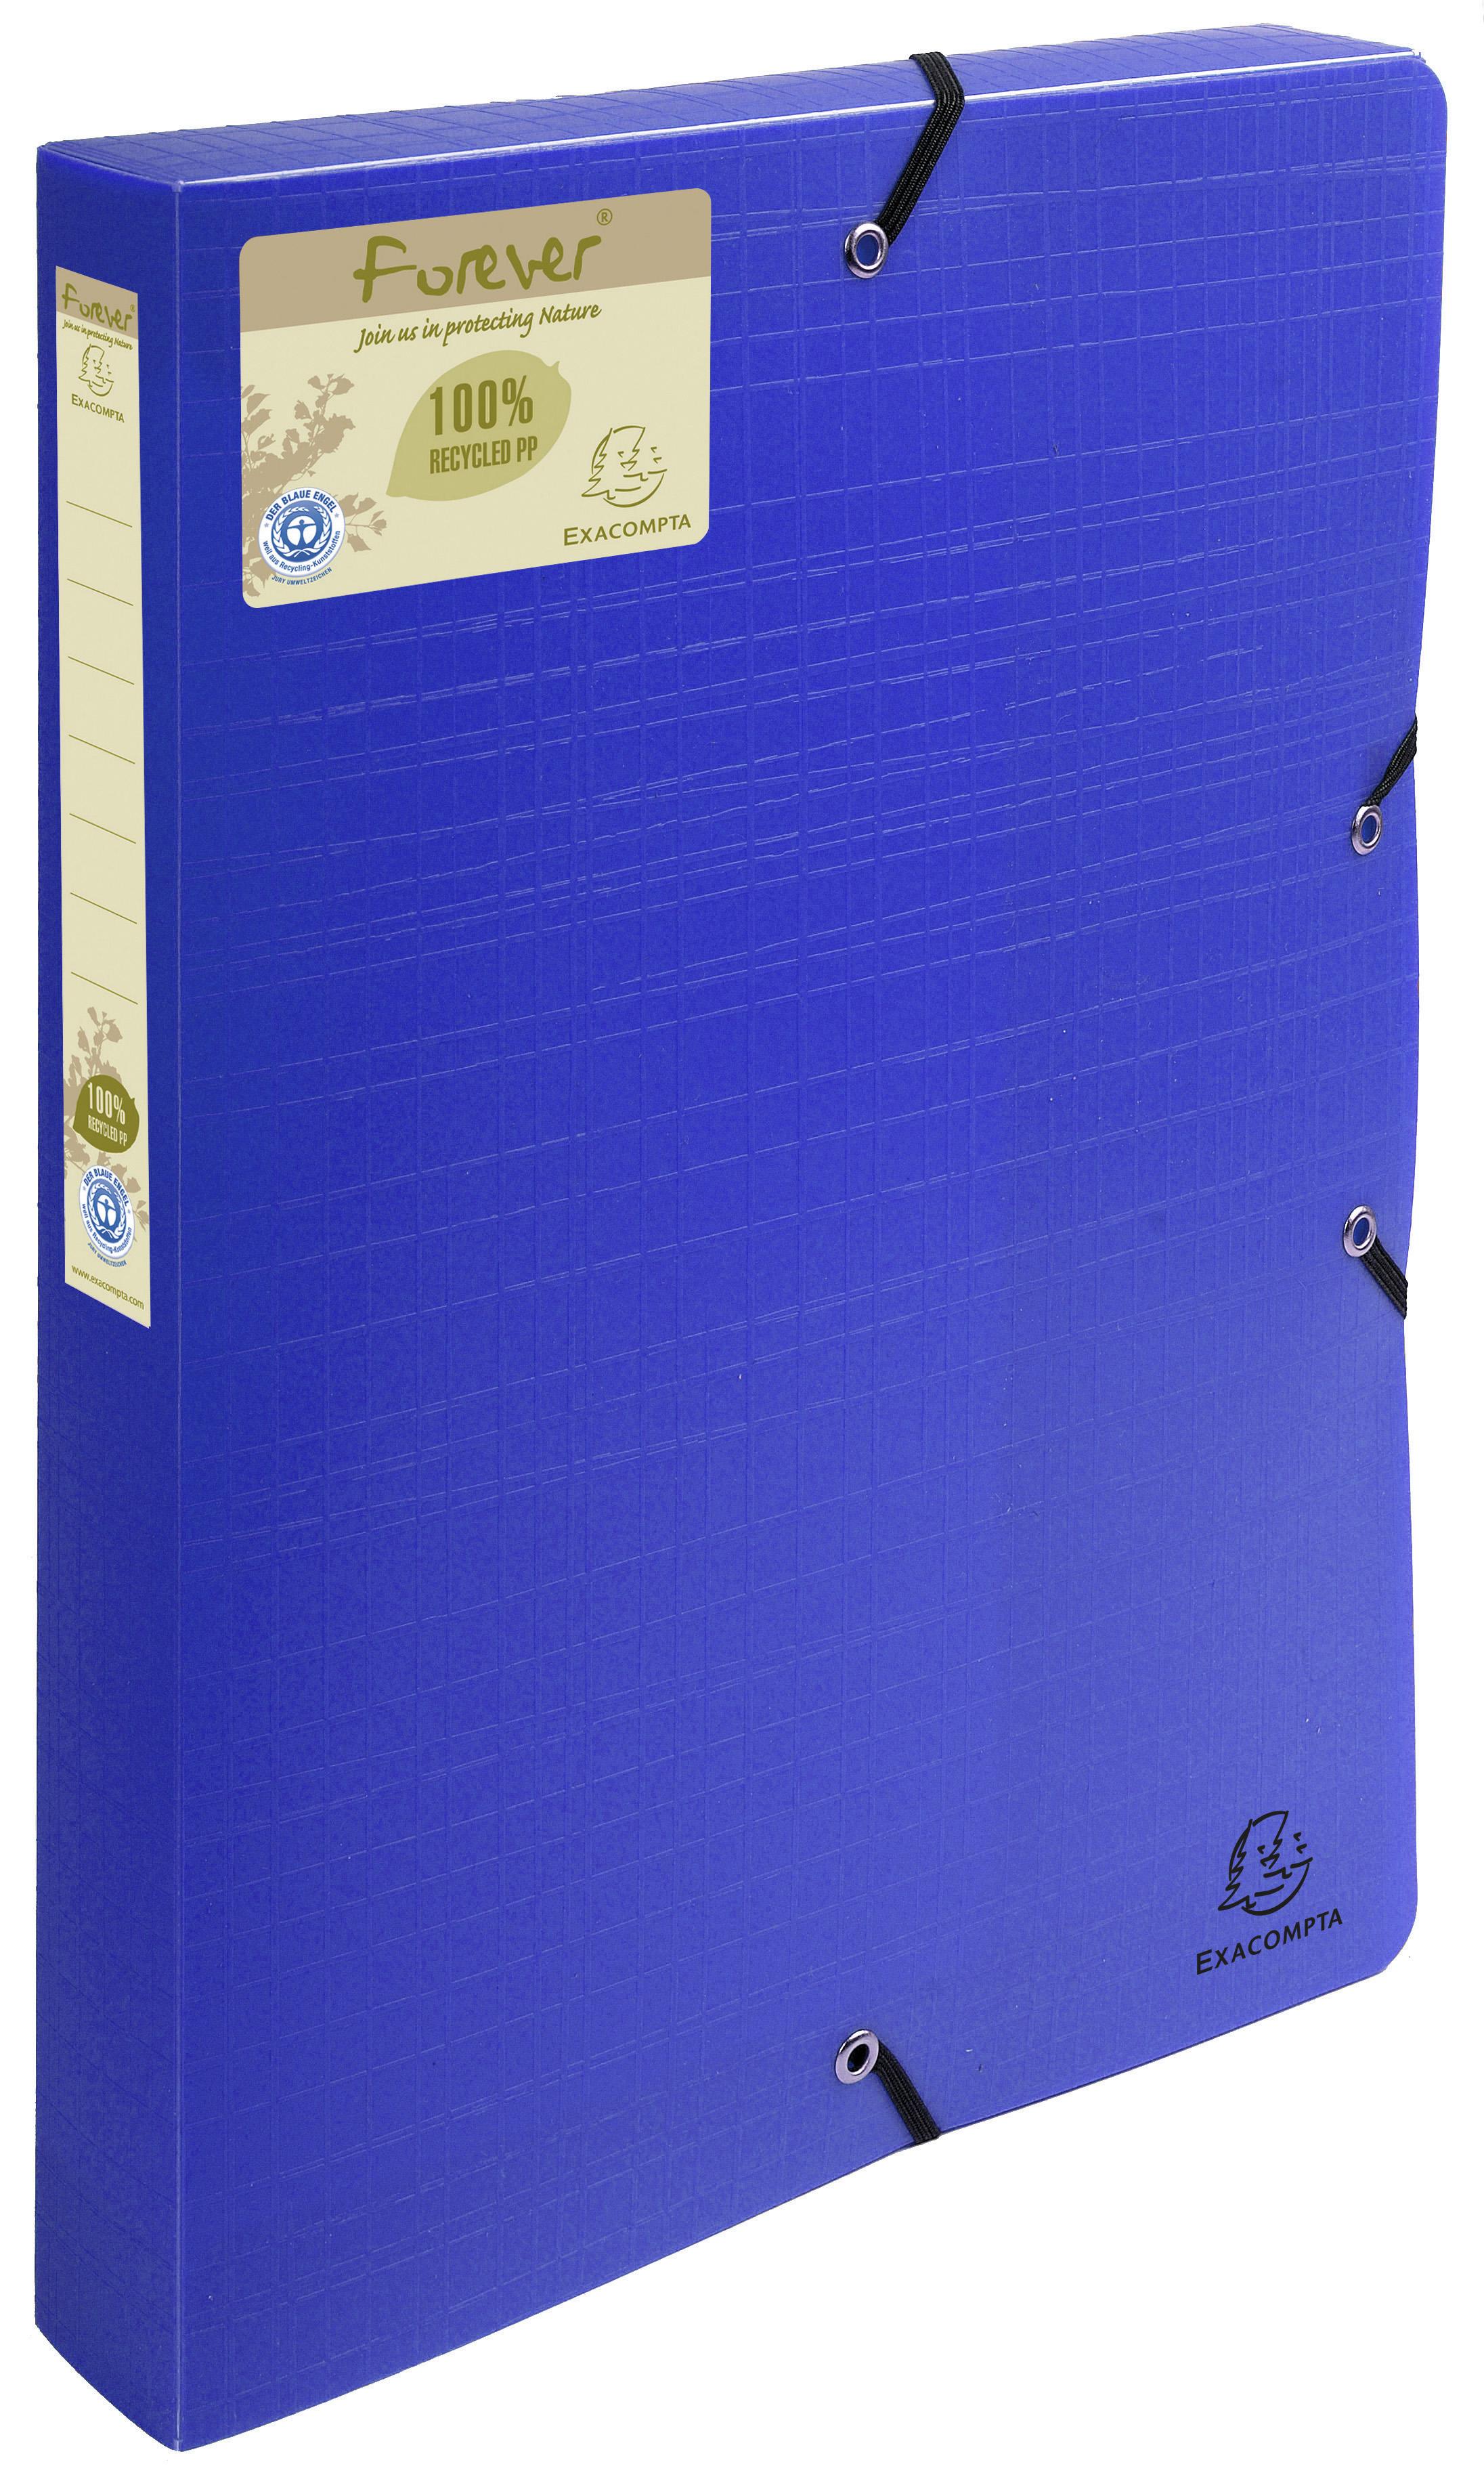 Forever Box File A4 40mm BL PP PK8